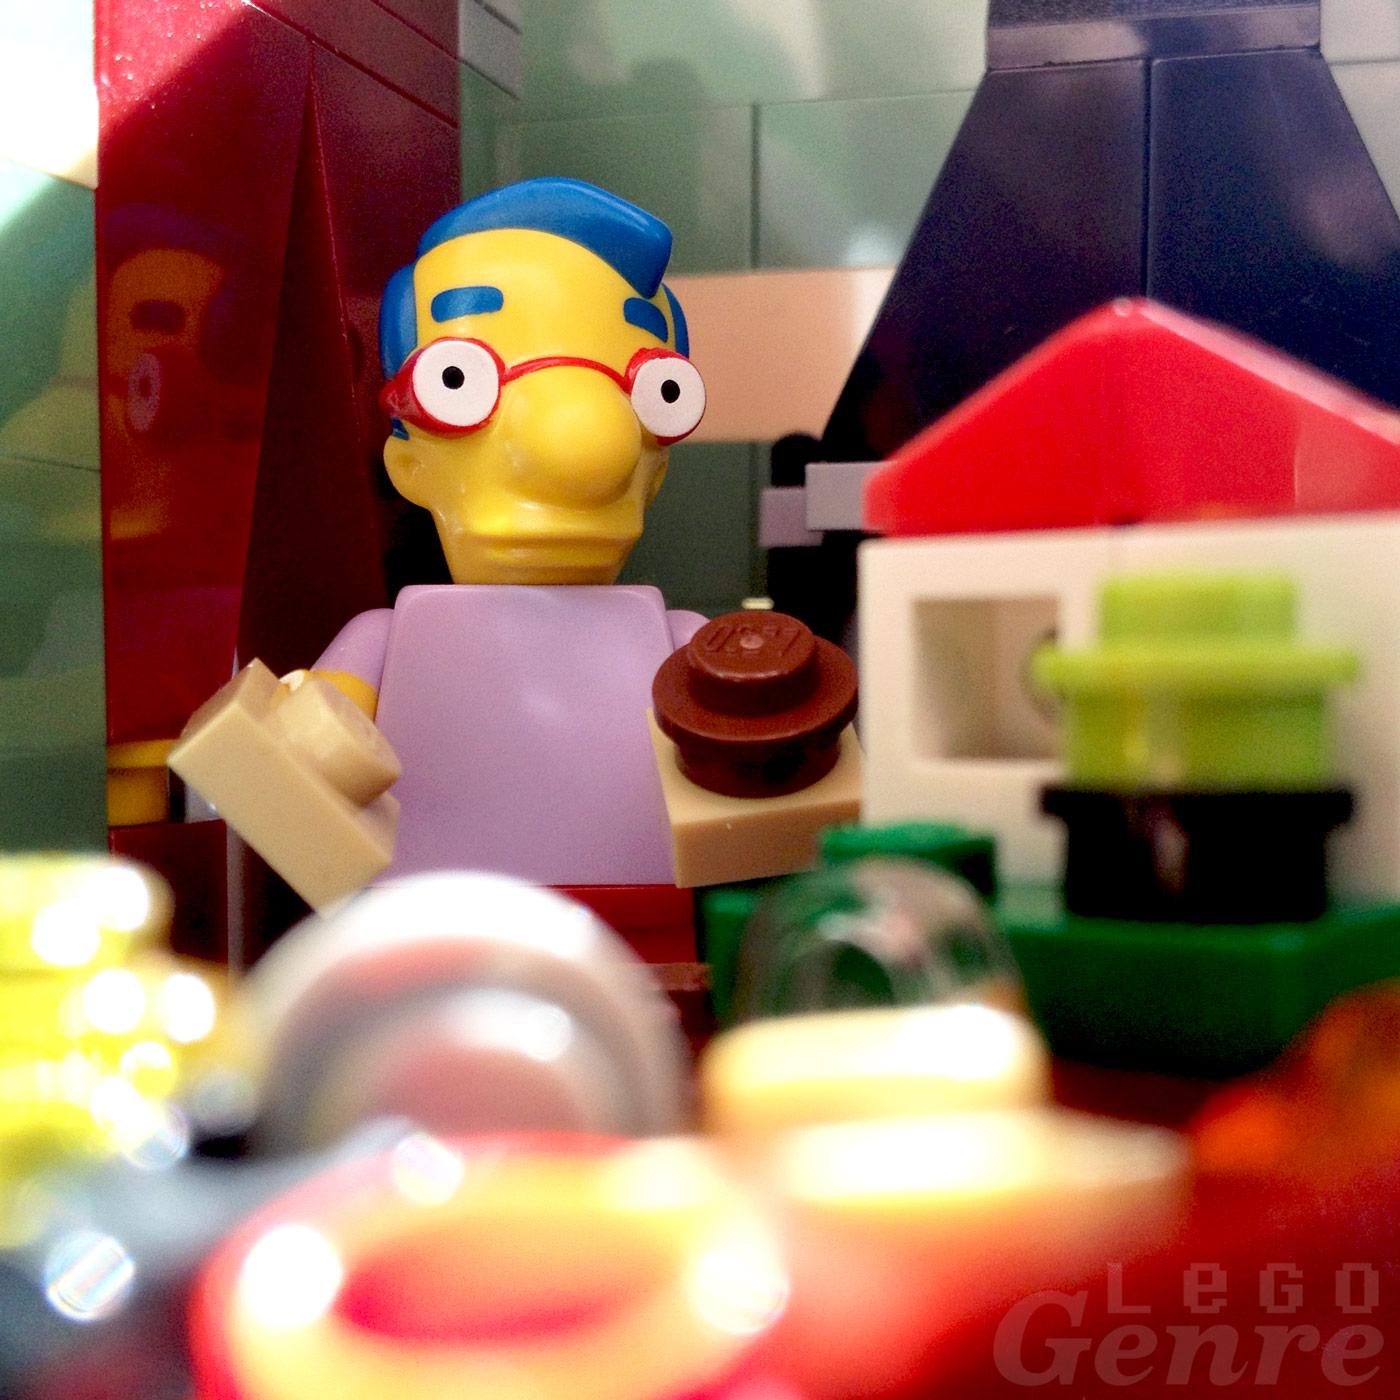 LegoGenre 00379: Master Builder Milhouse